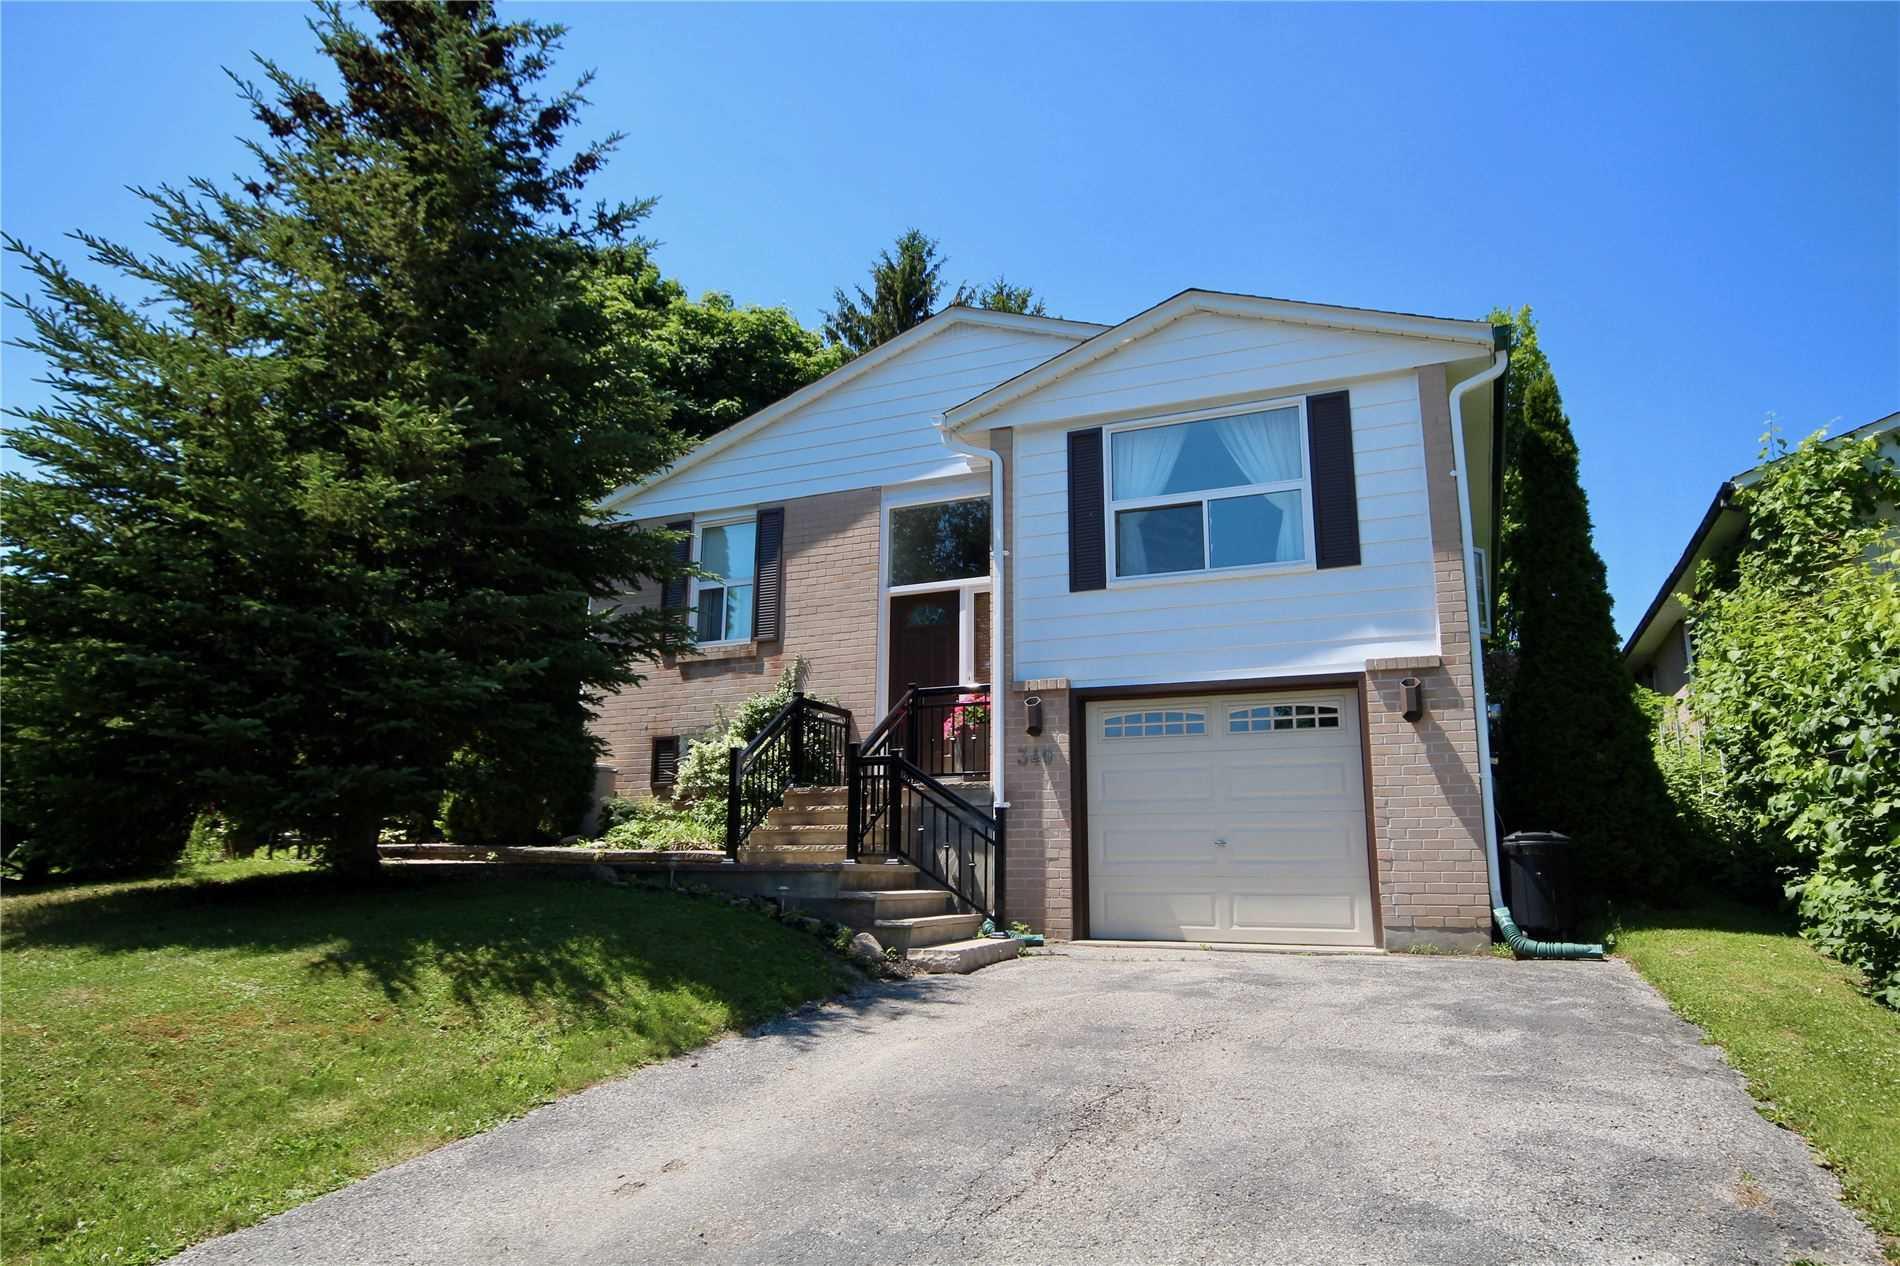 340 Dixon Blvd, Newmarket, Ontario L3Y4V6, 3 Bedrooms Bedrooms, 6 Rooms Rooms,2 BathroomsBathrooms,Detached,For Sale,Dixon,N4803418